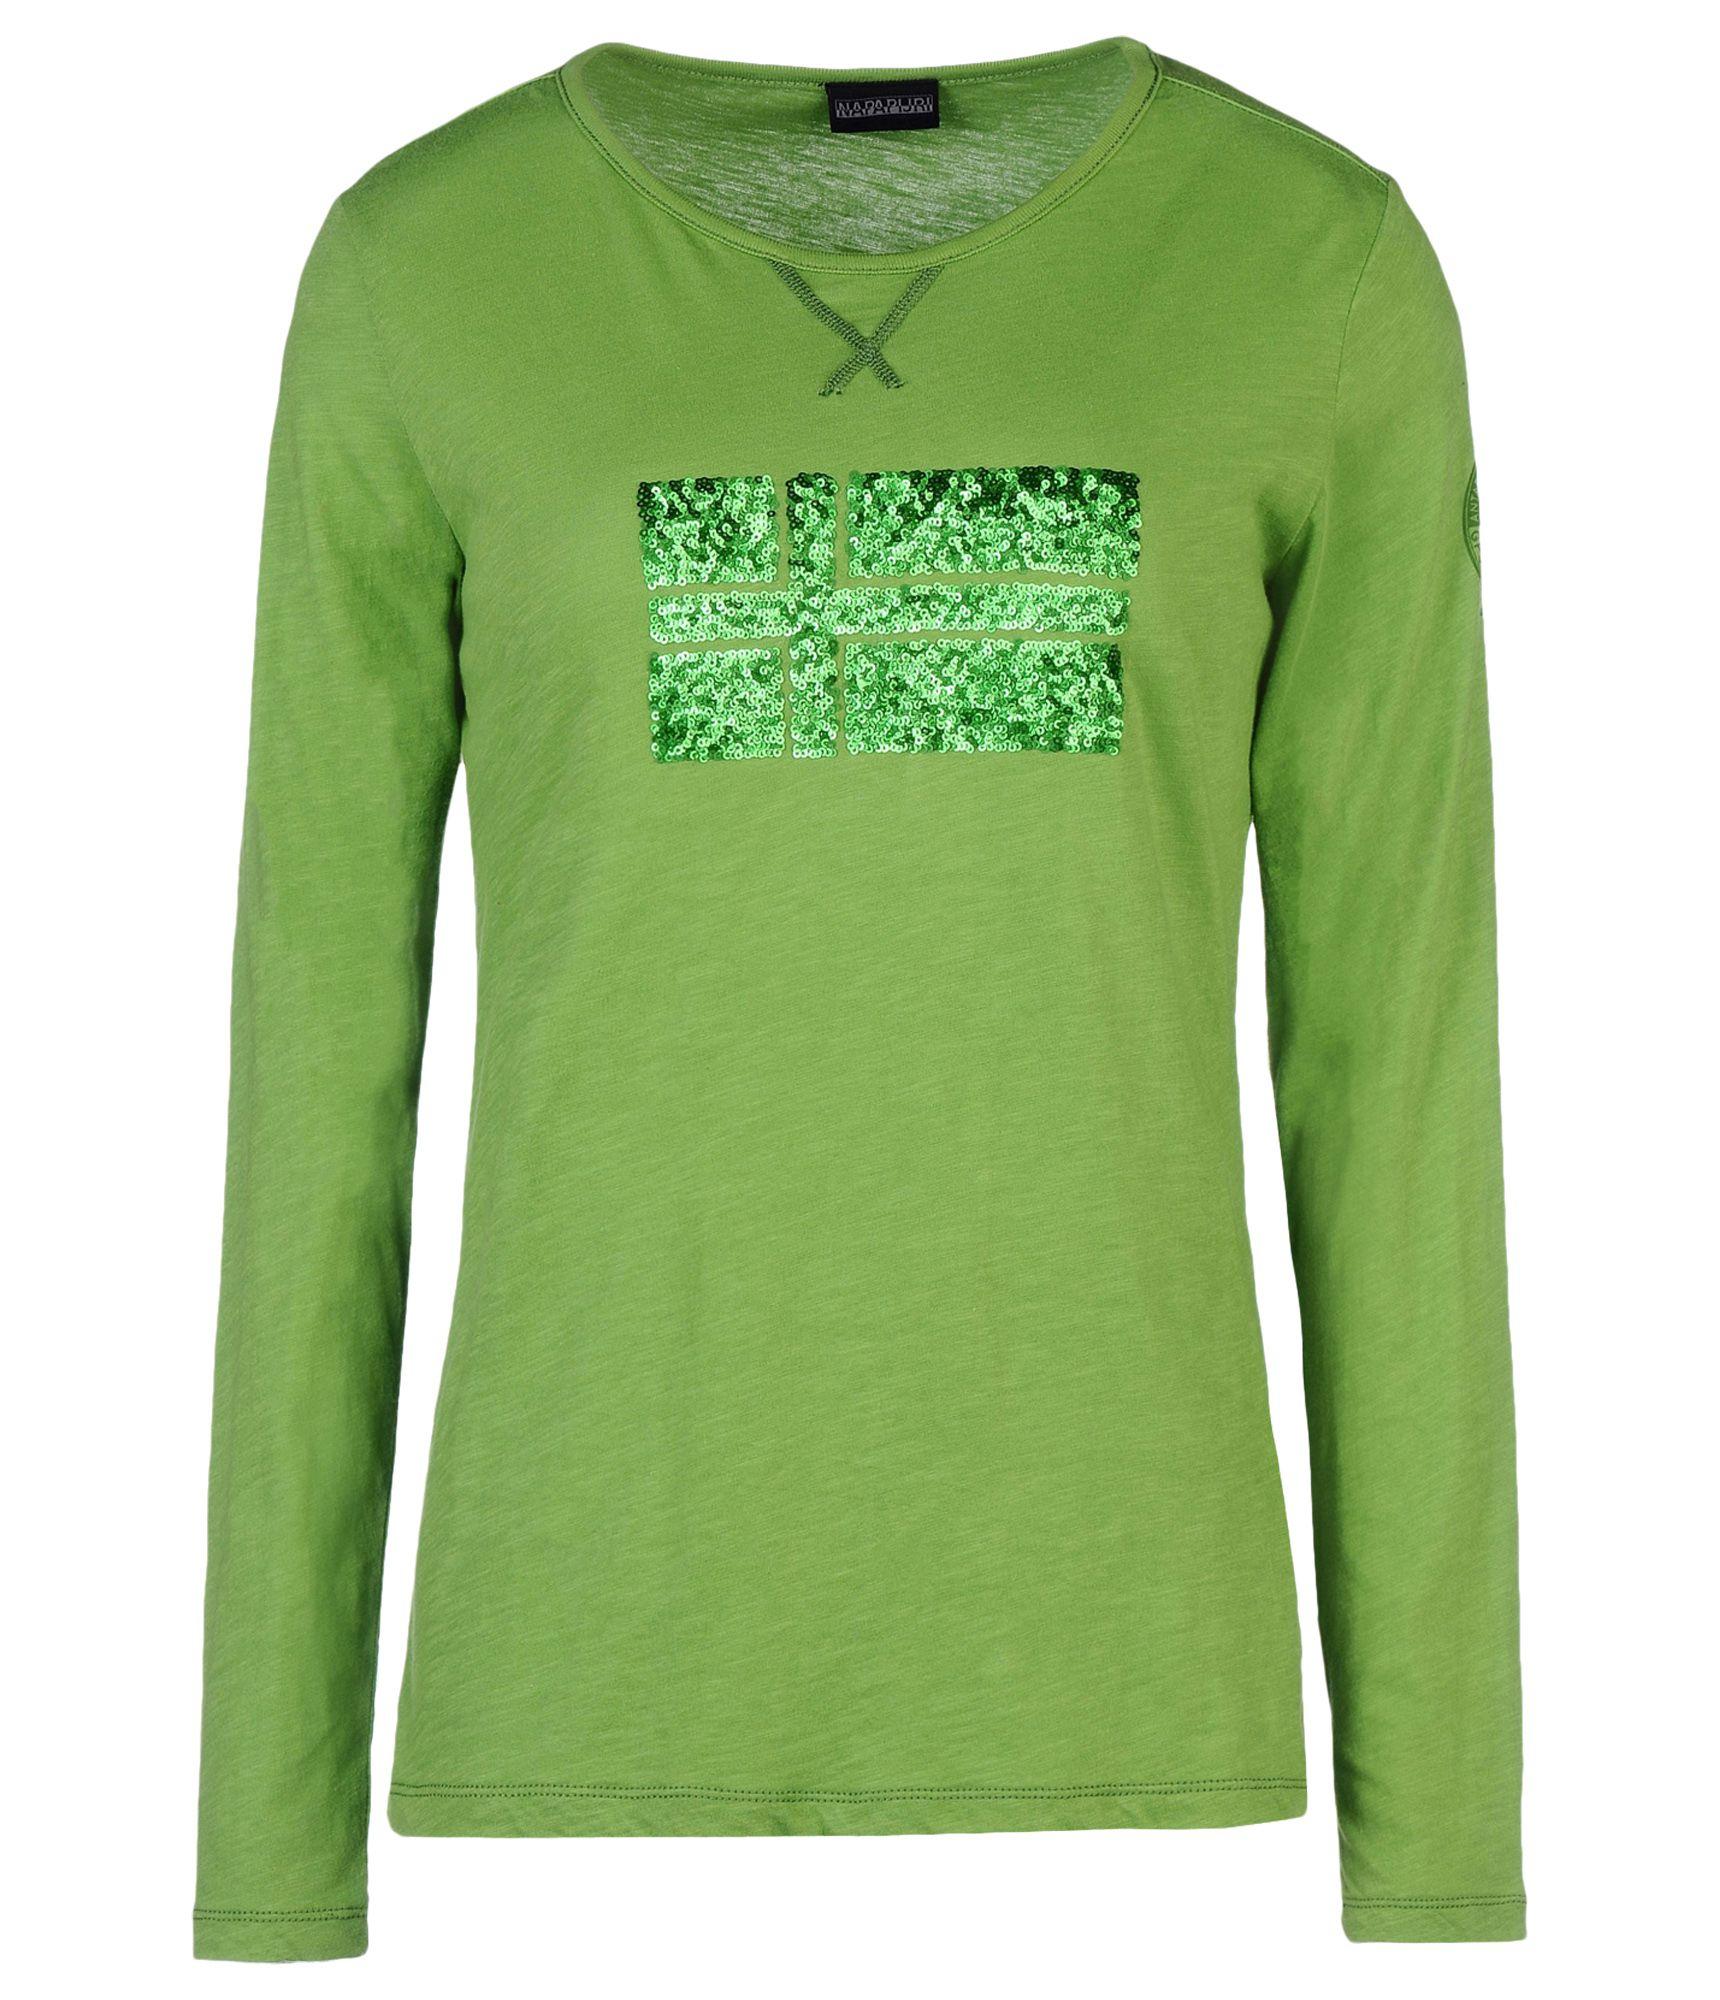 Napapijri long sleeve t shirt in green apple green lyst for Apple green dress shirt